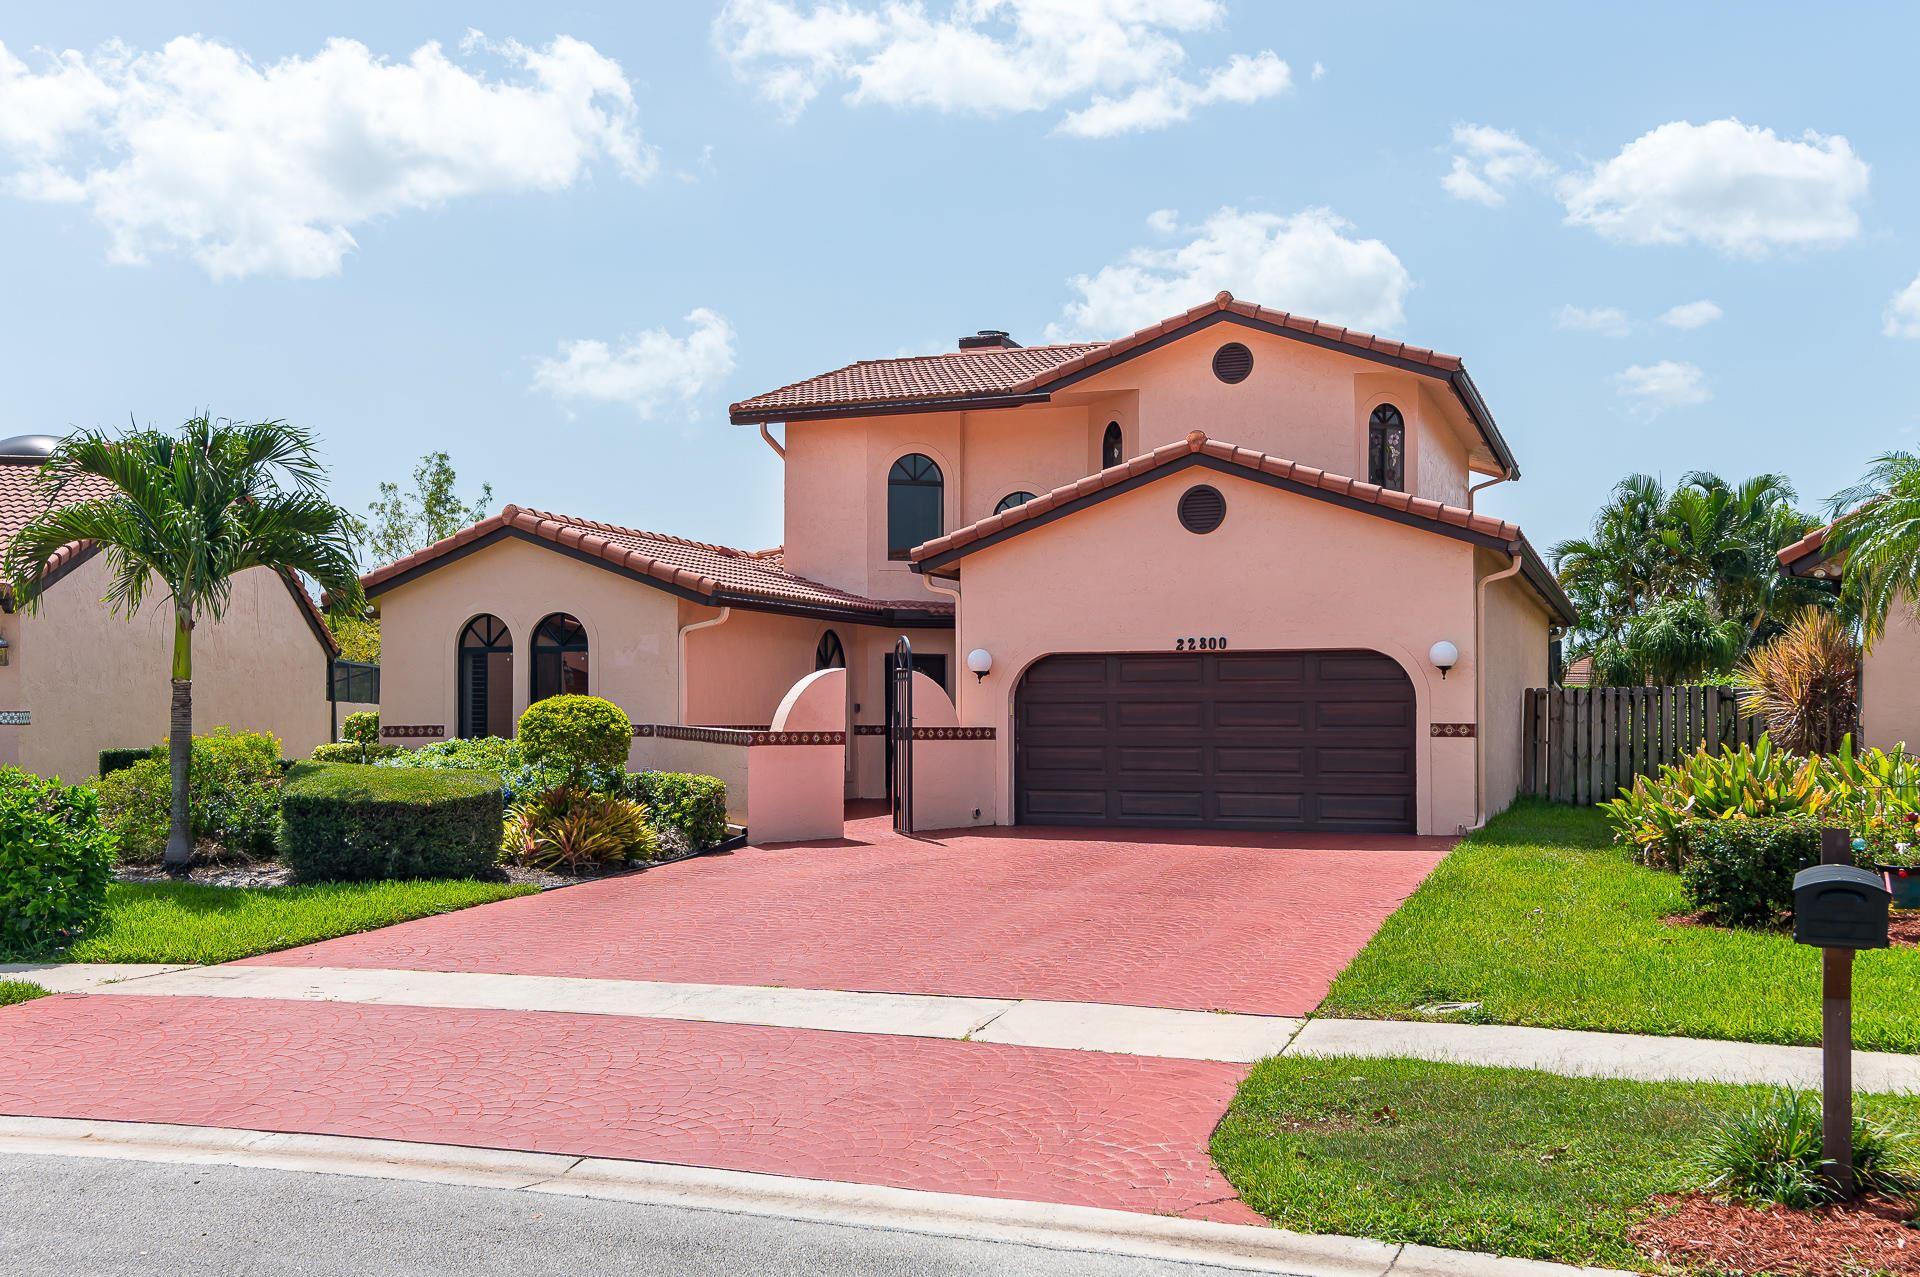 22800 Marbella Circle, Boca Raton, FL 33433 - #: RX-10635941